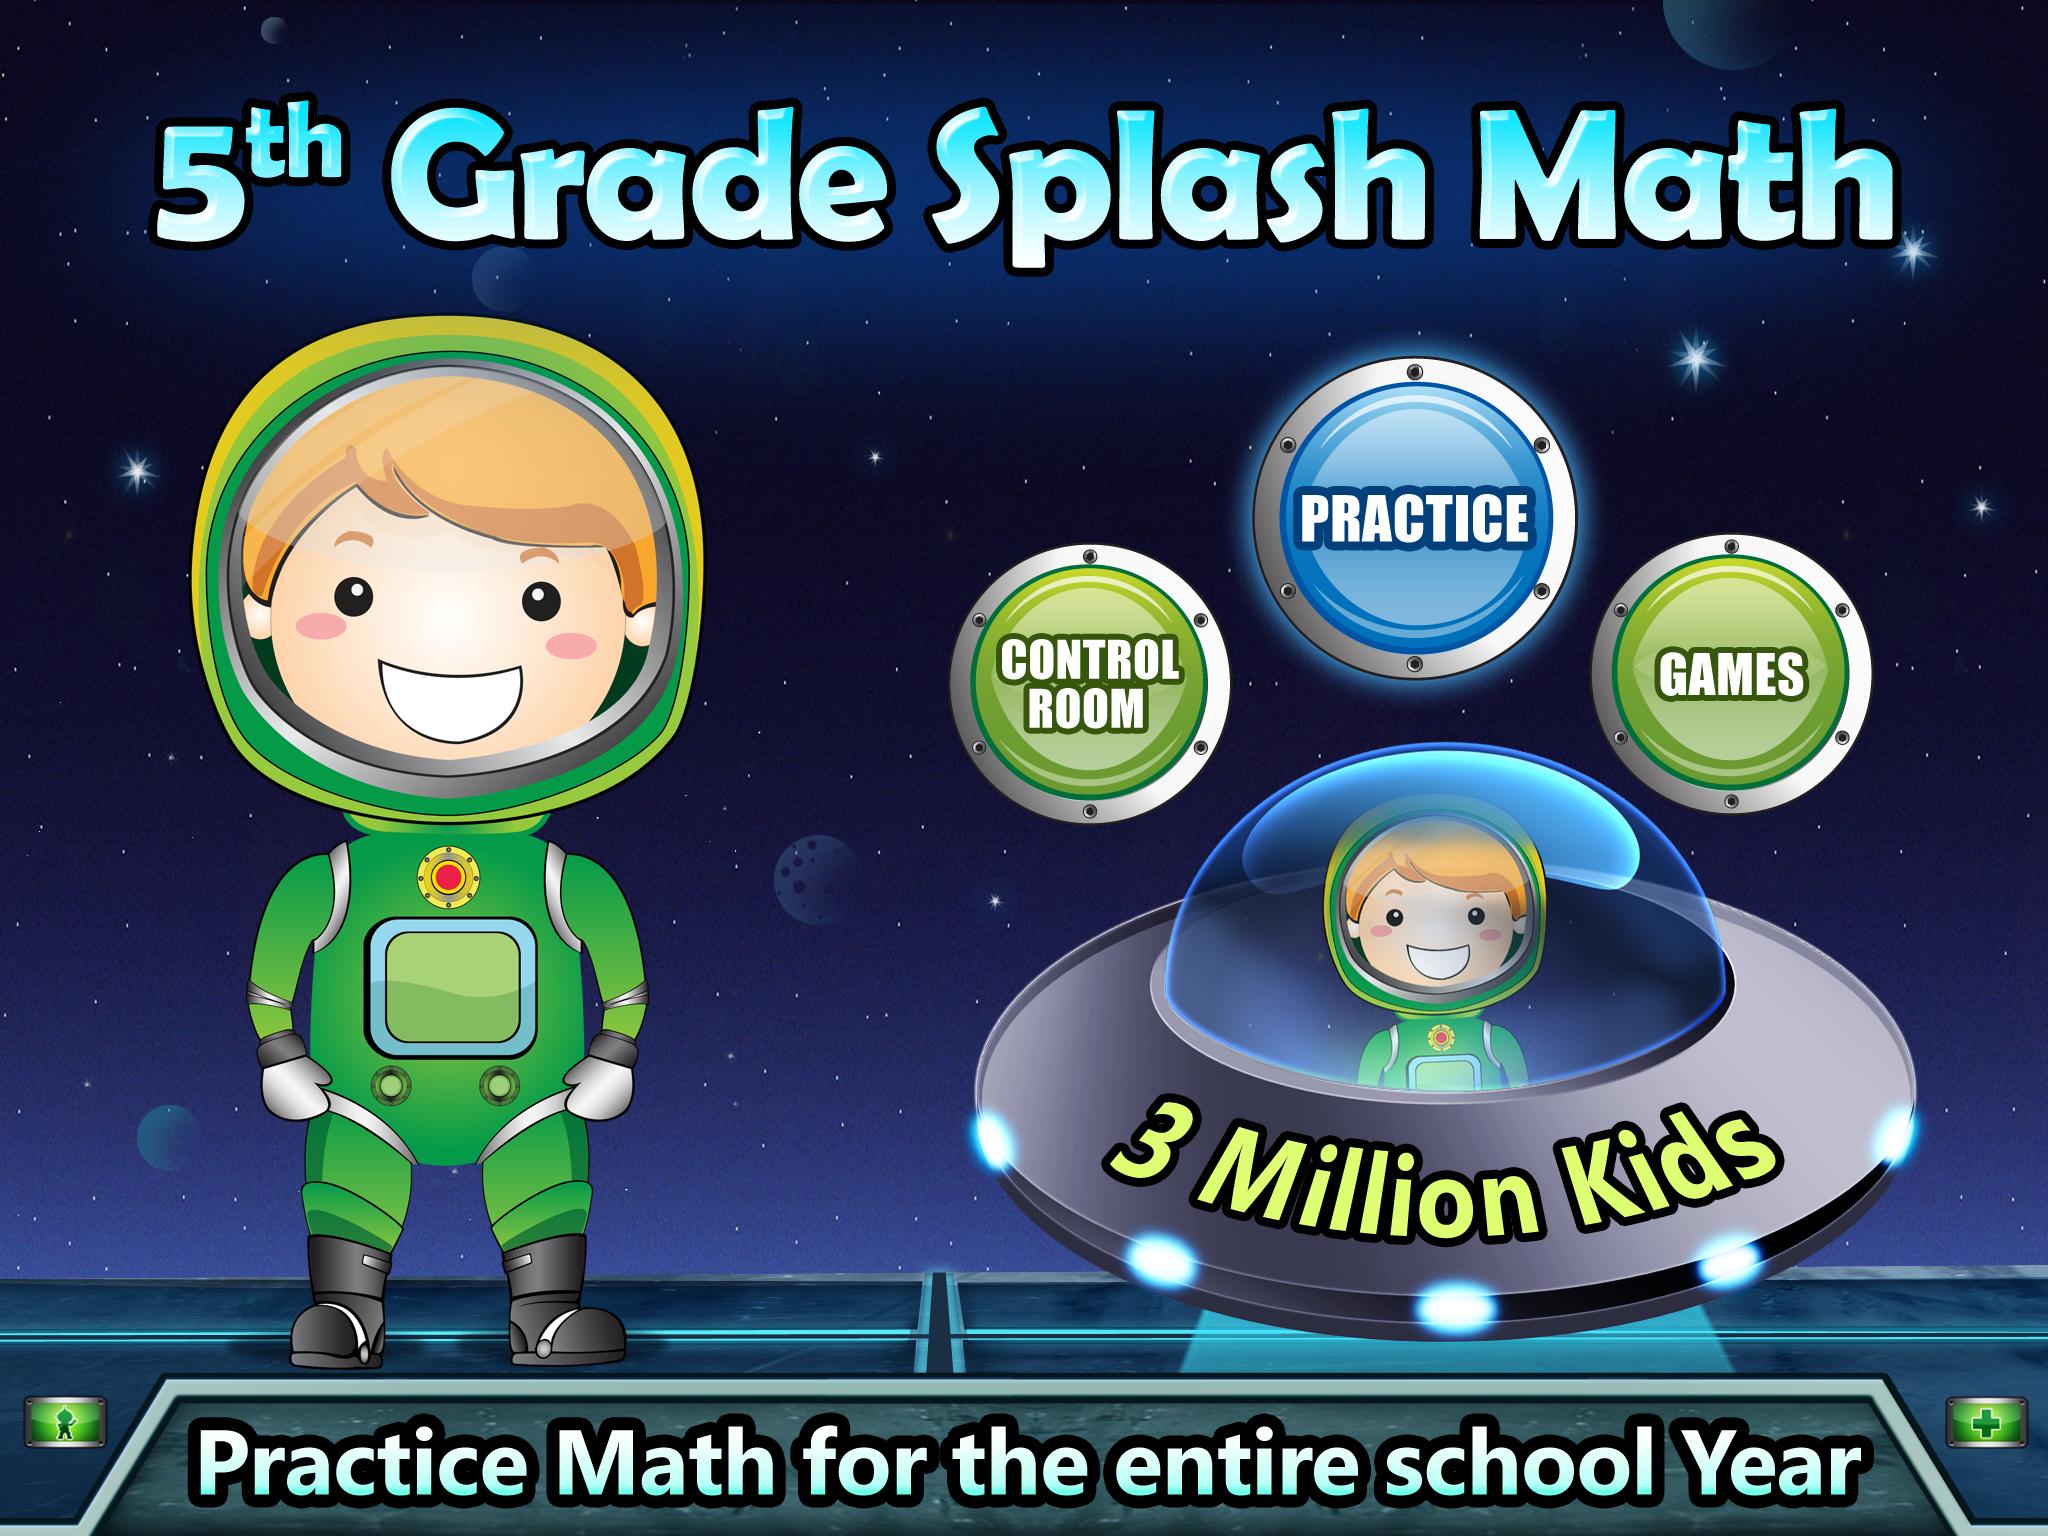 Splash Math Fun Math Practice For Grades 1 5 Splash Math 5th Grade Math Fun Math Homeschool Math [ 1536 x 2048 Pixel ]